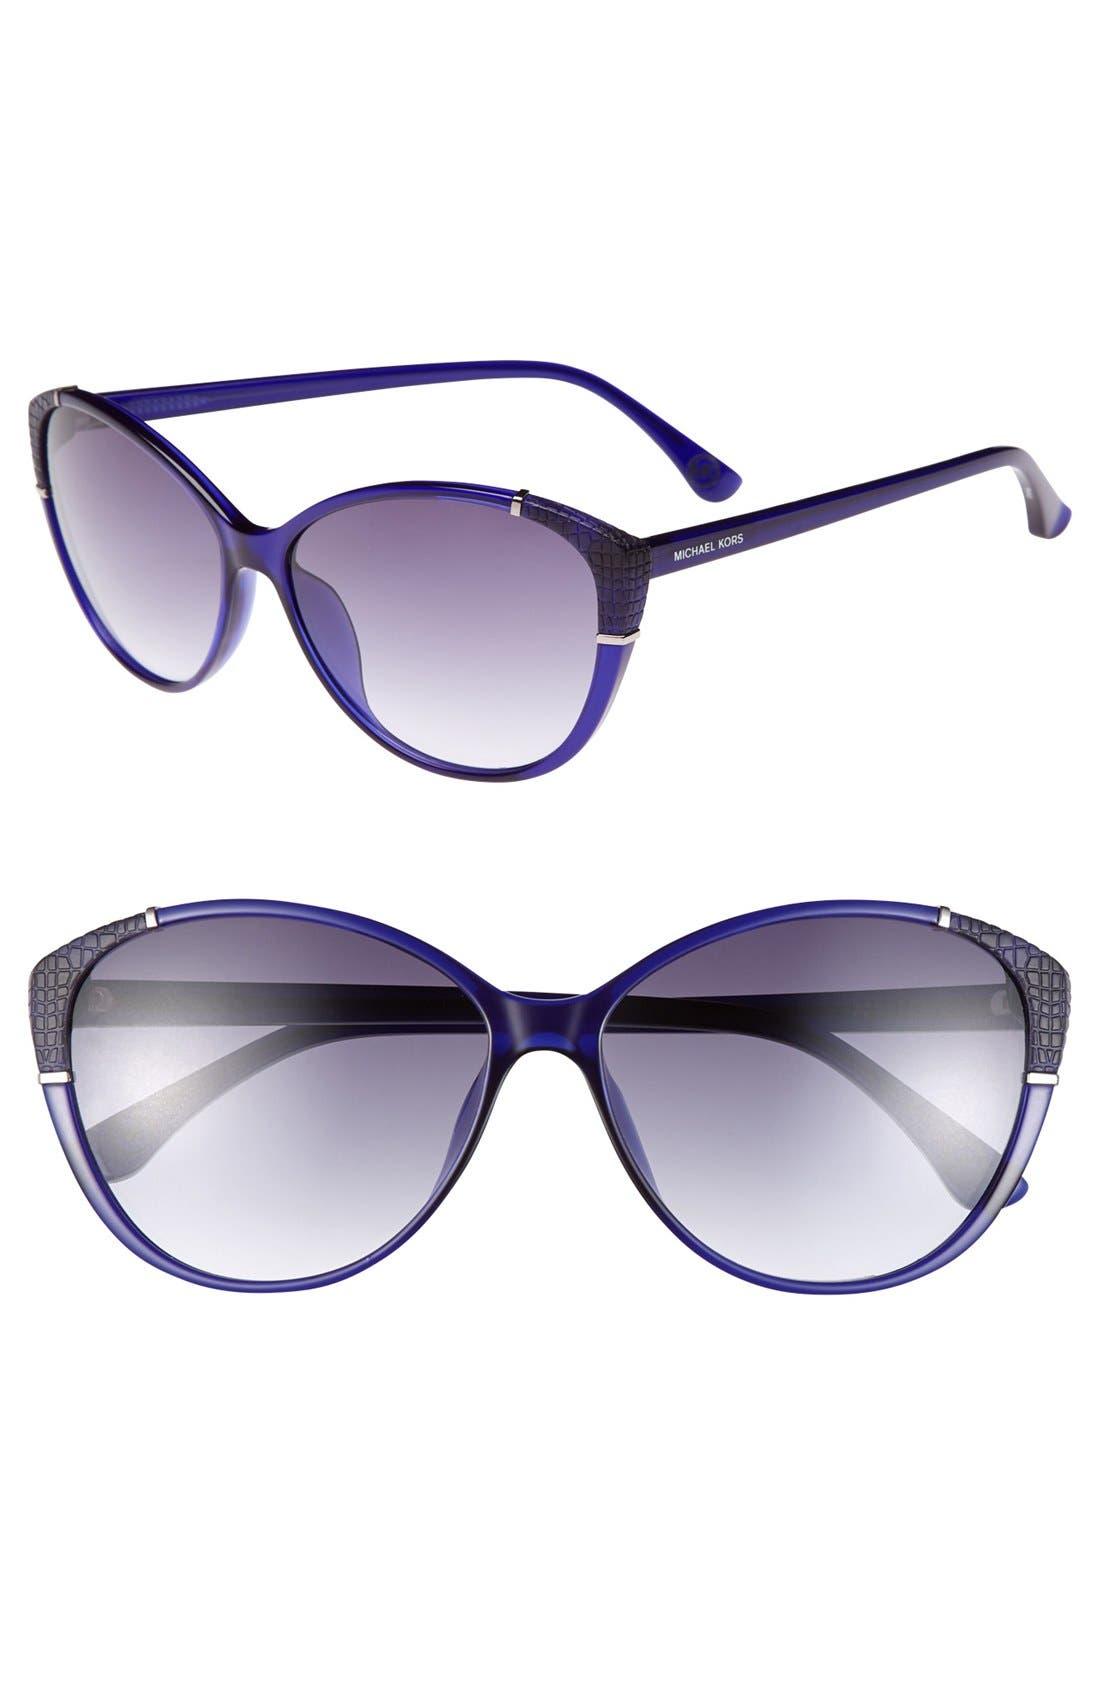 Alternate Image 1 Selected - MICHAEL Michael Kors 'Paige' 58mm Sunglasses